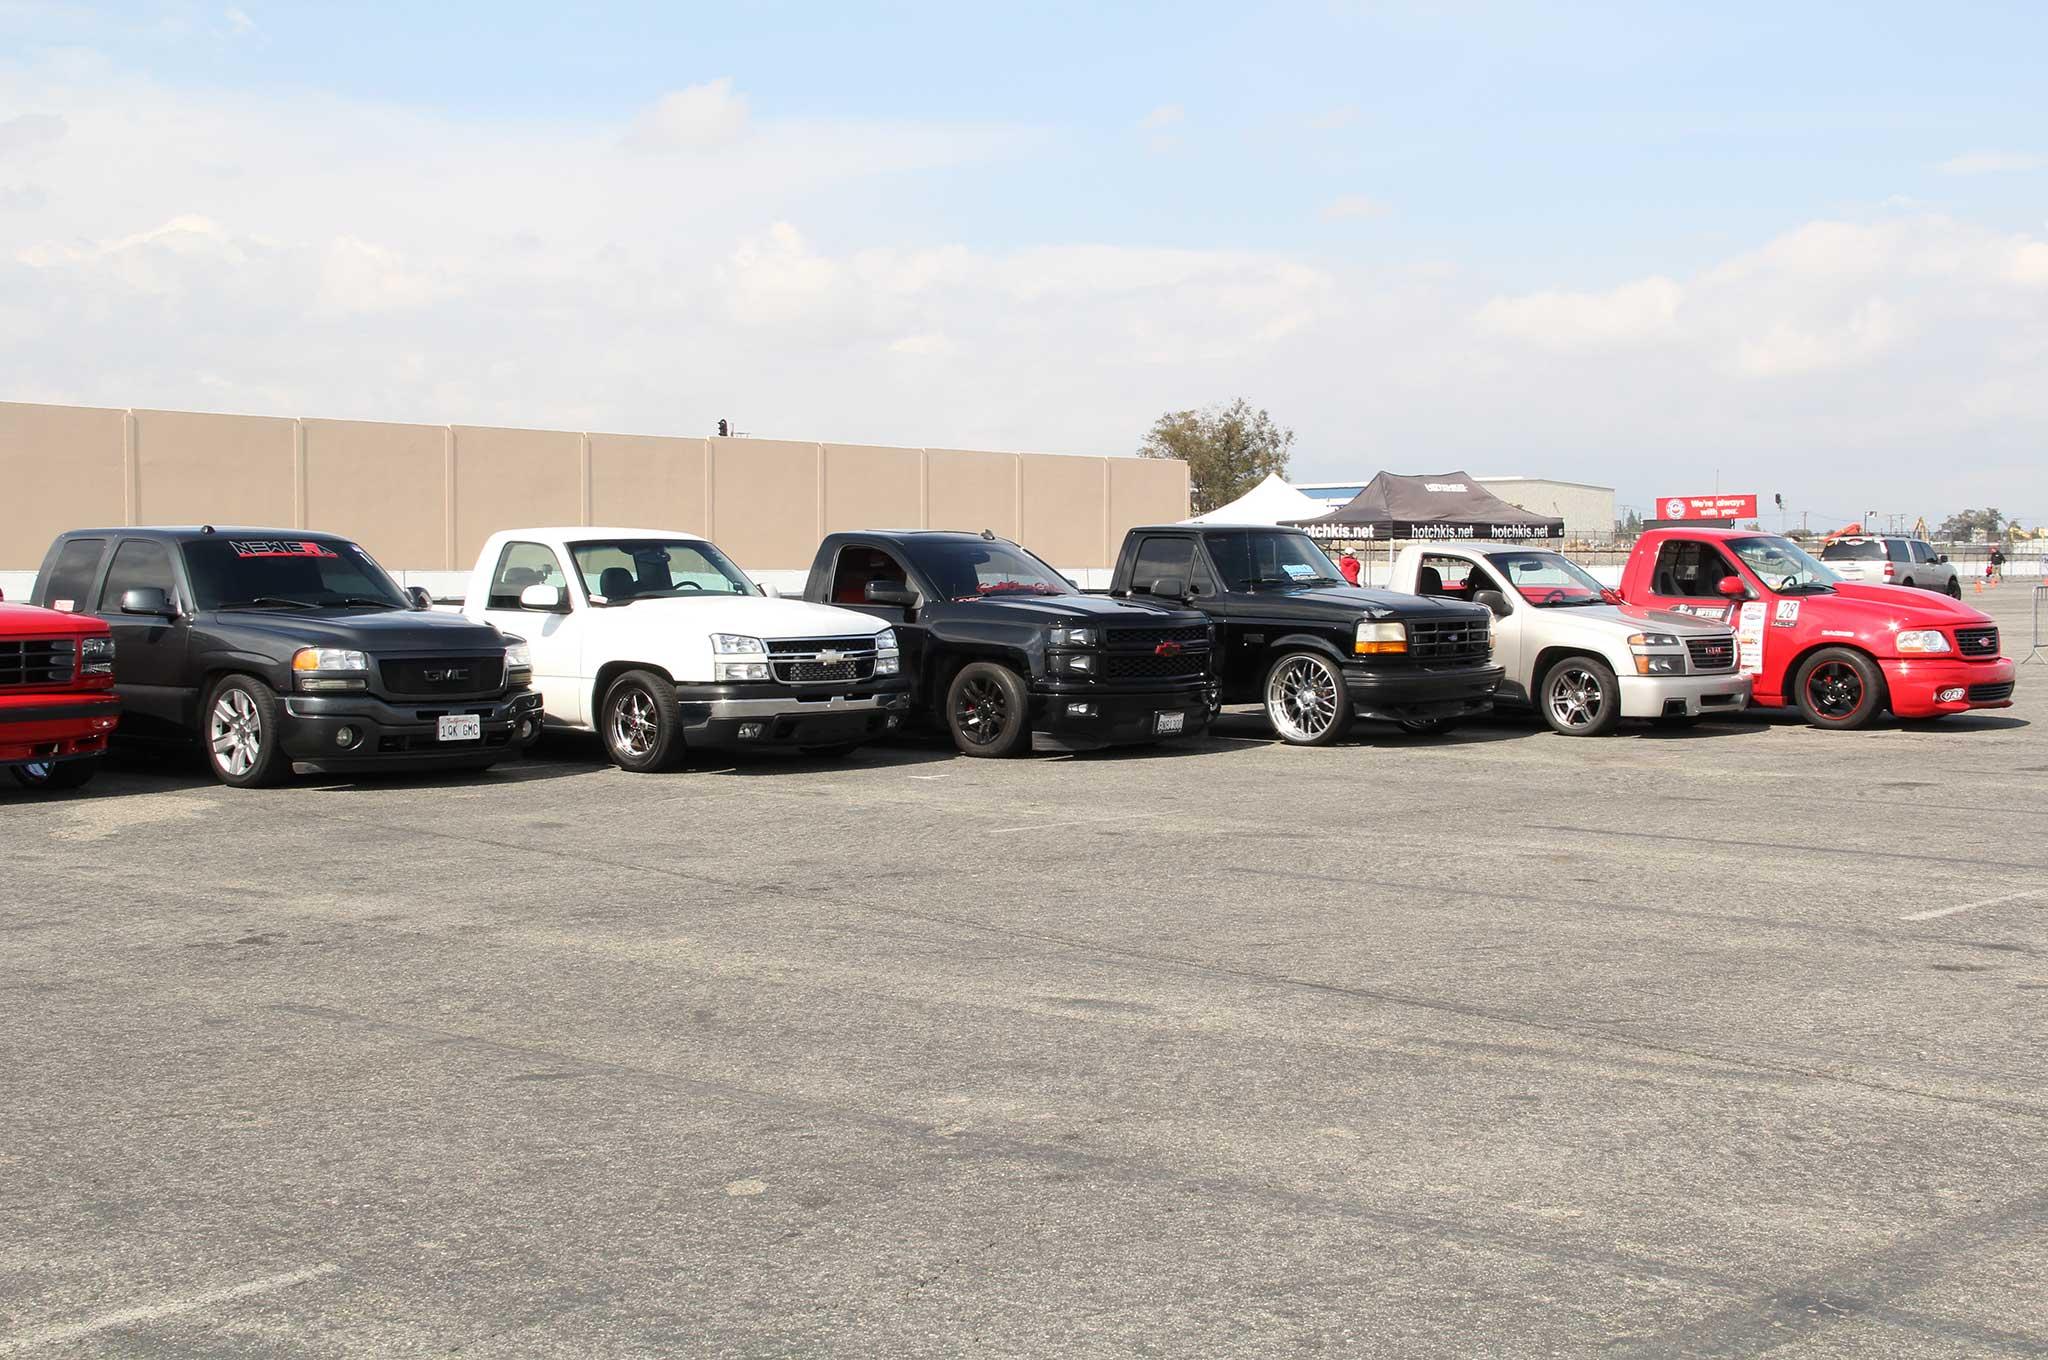 Truckin Throwdown 2015 Part 1 - Meet the Competitors - Presented by EBC Brakes